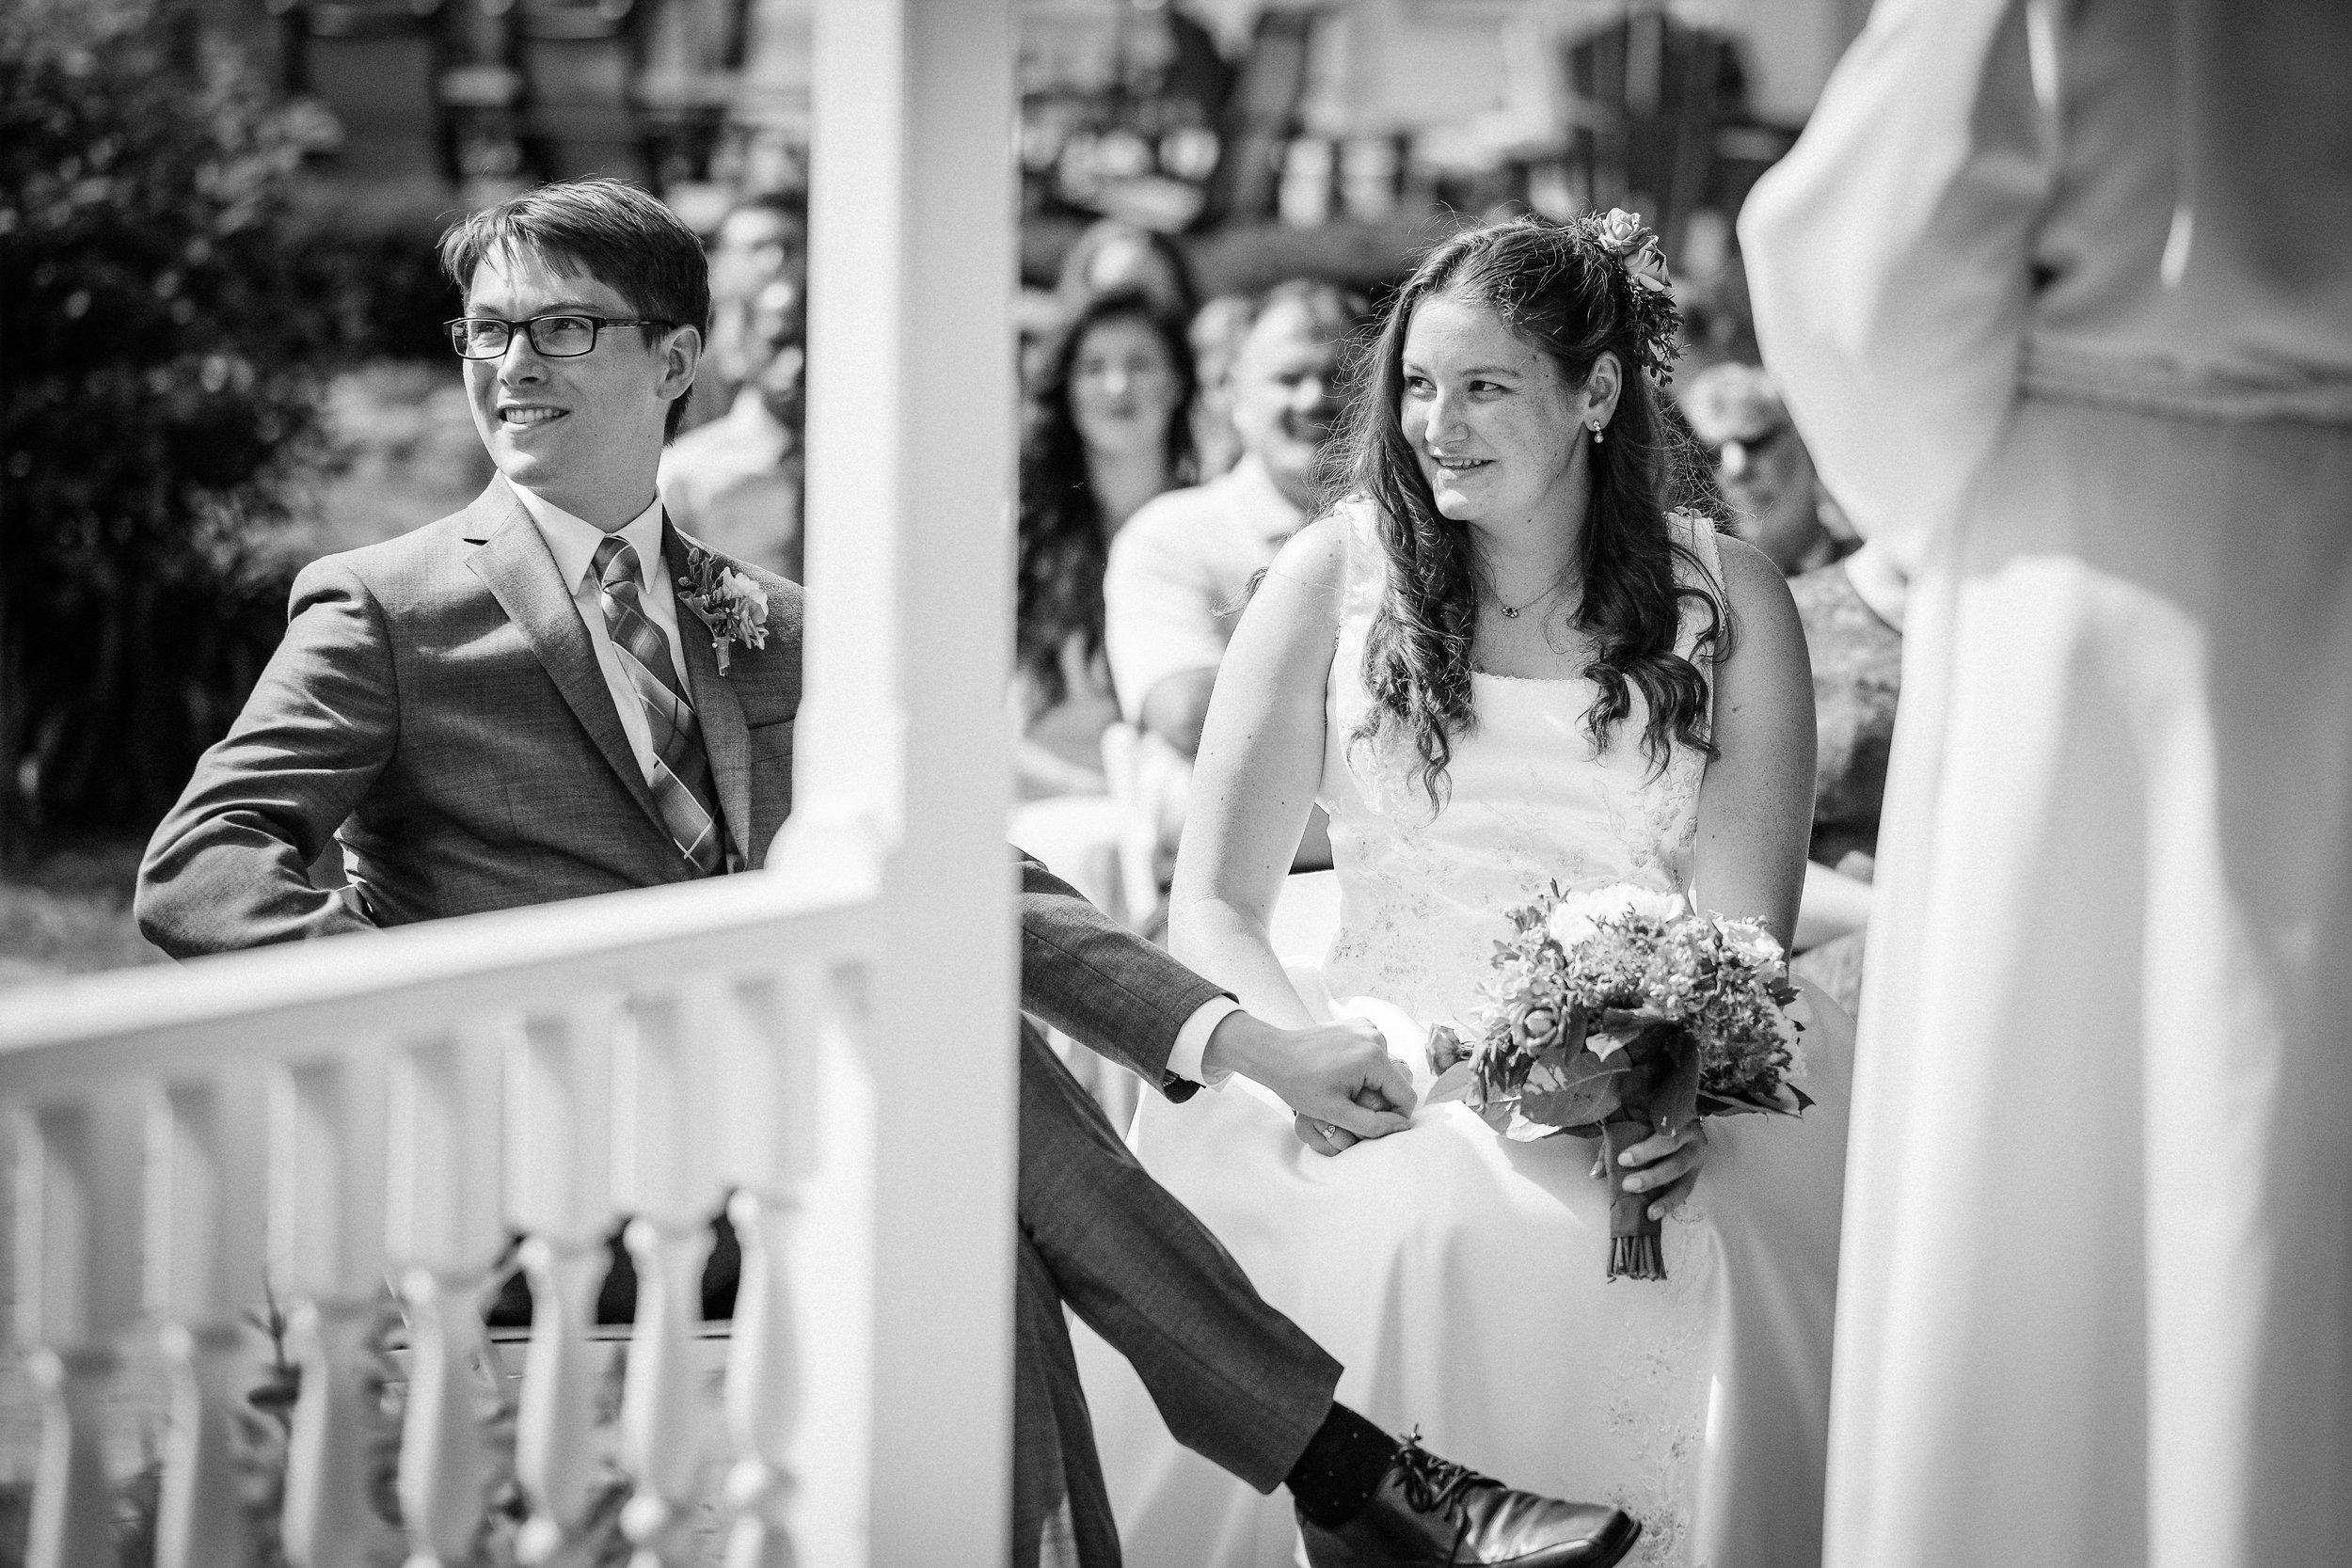 Vermont-Lilac-Inn-Wedding-Photography-567.jpg